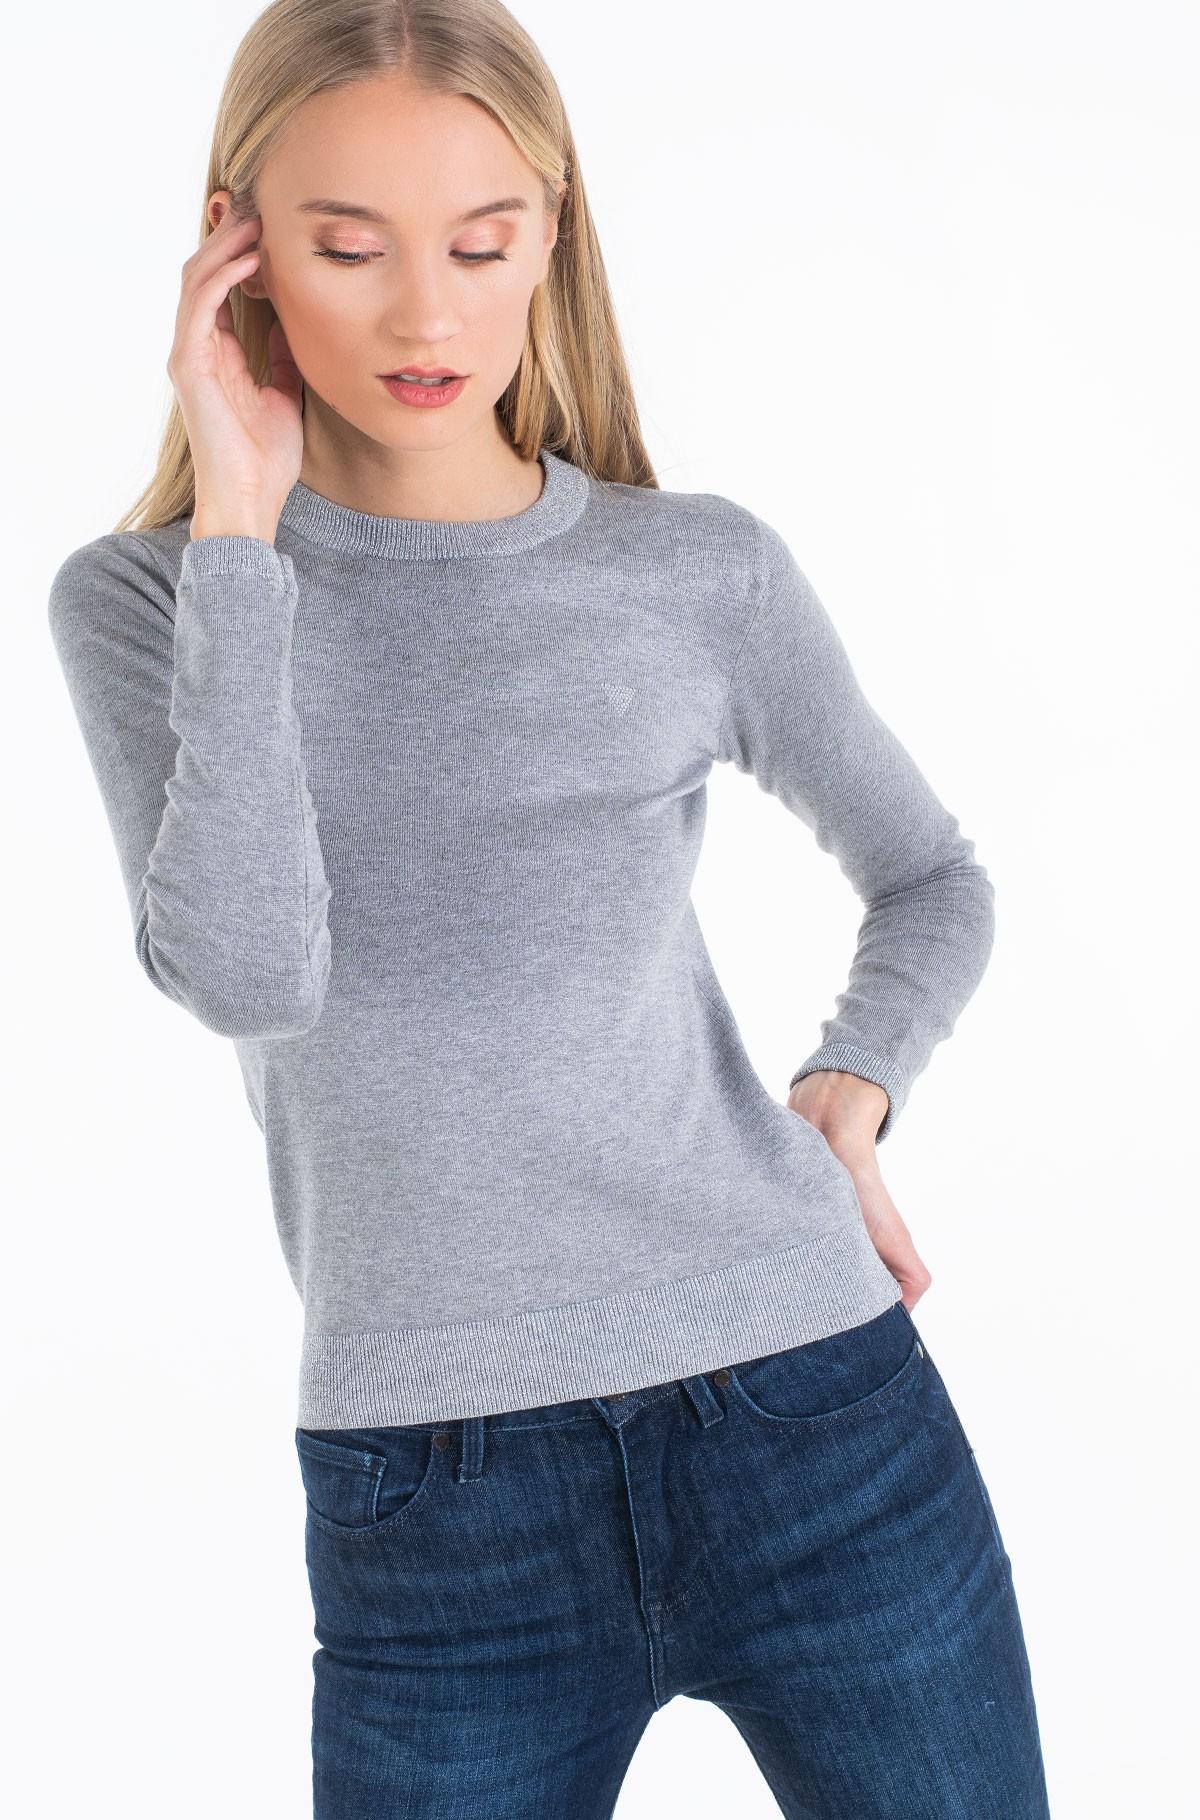 Sweater W01R0P Z2760-full-1